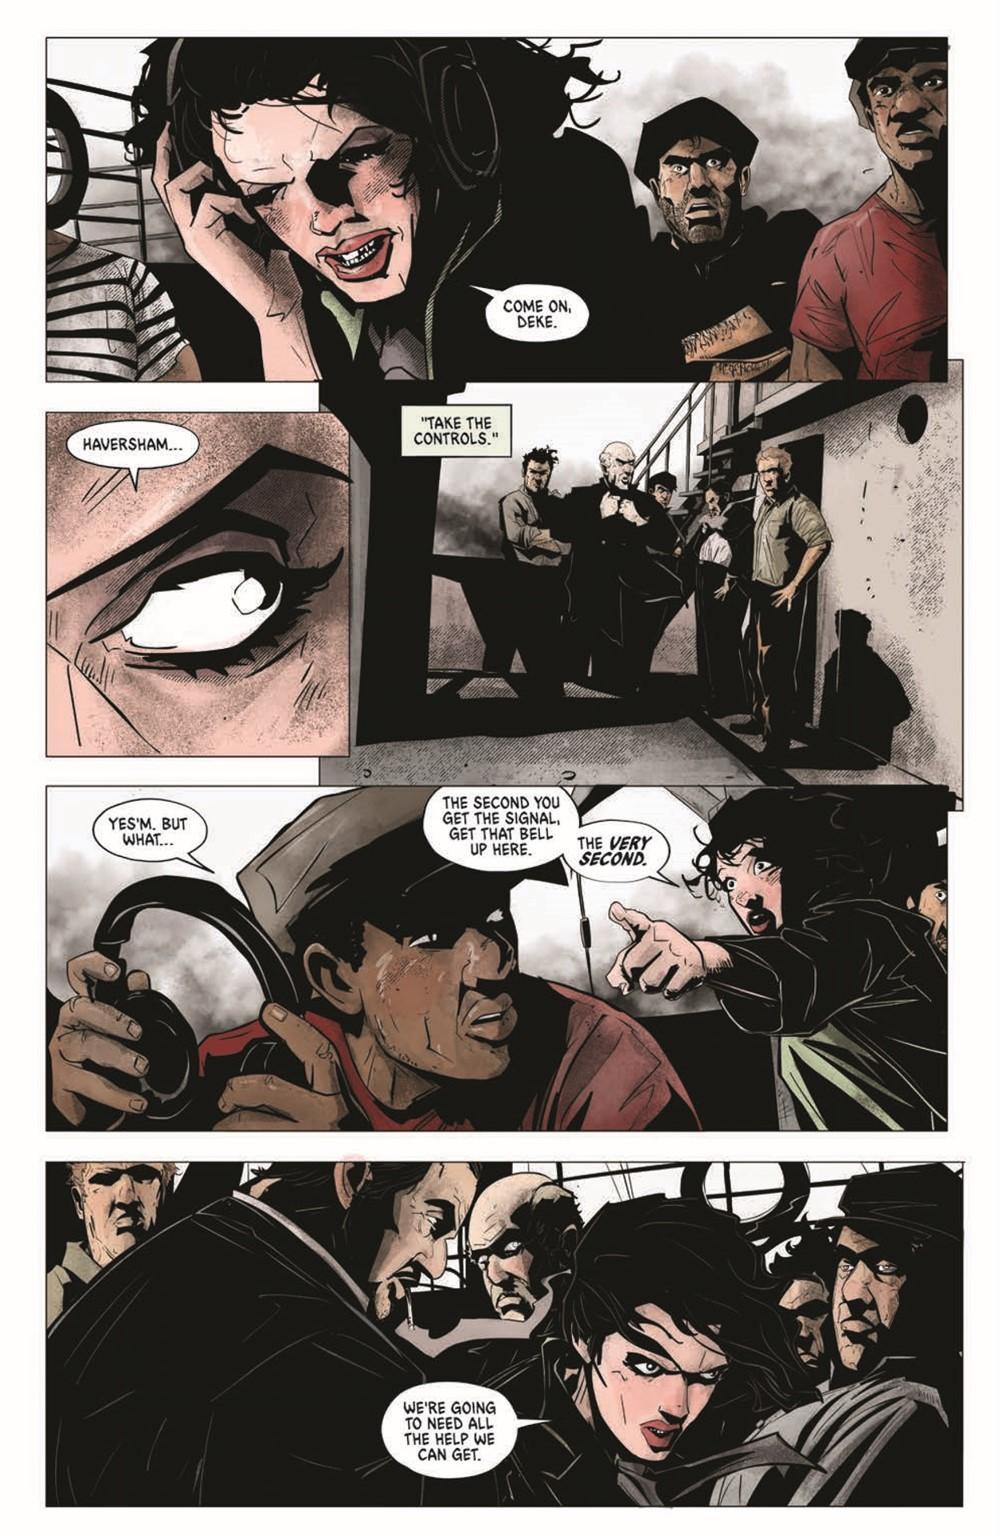 SeaOfSorrow04_pr-7 ComicList Previews: SEA OF SORROWS #3 (OF 5)